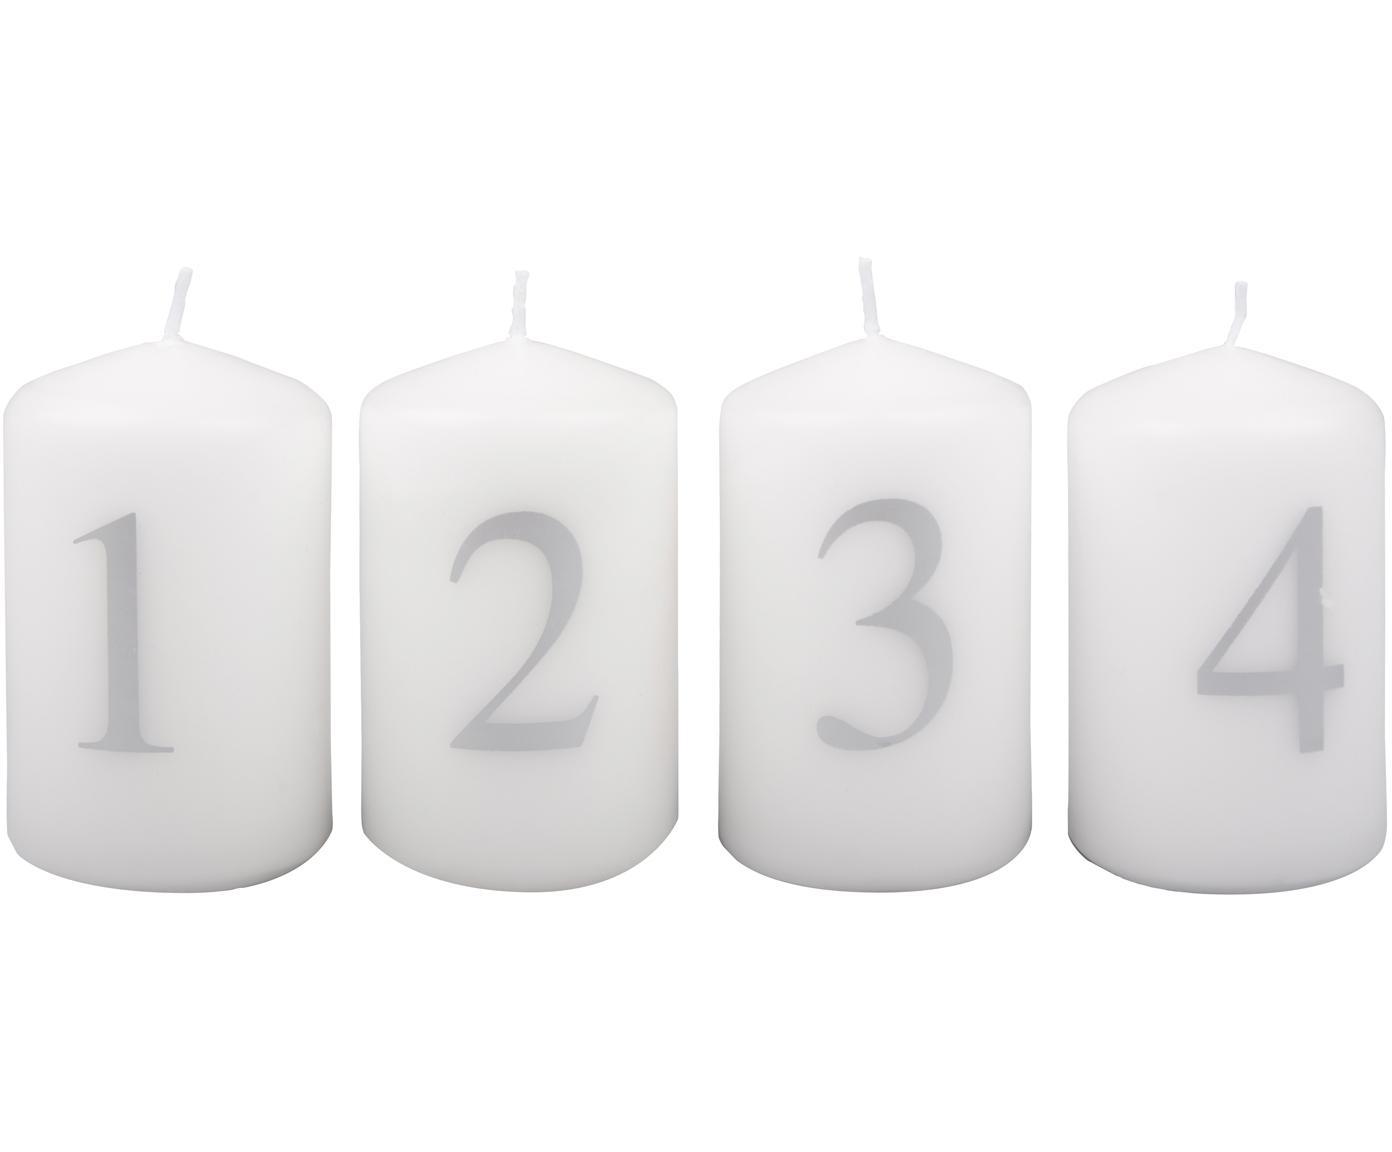 Set de velas de Adviento Aven, 4pzas., Parafina, Blanco, plateado, Ø 6 x Al 9 cm